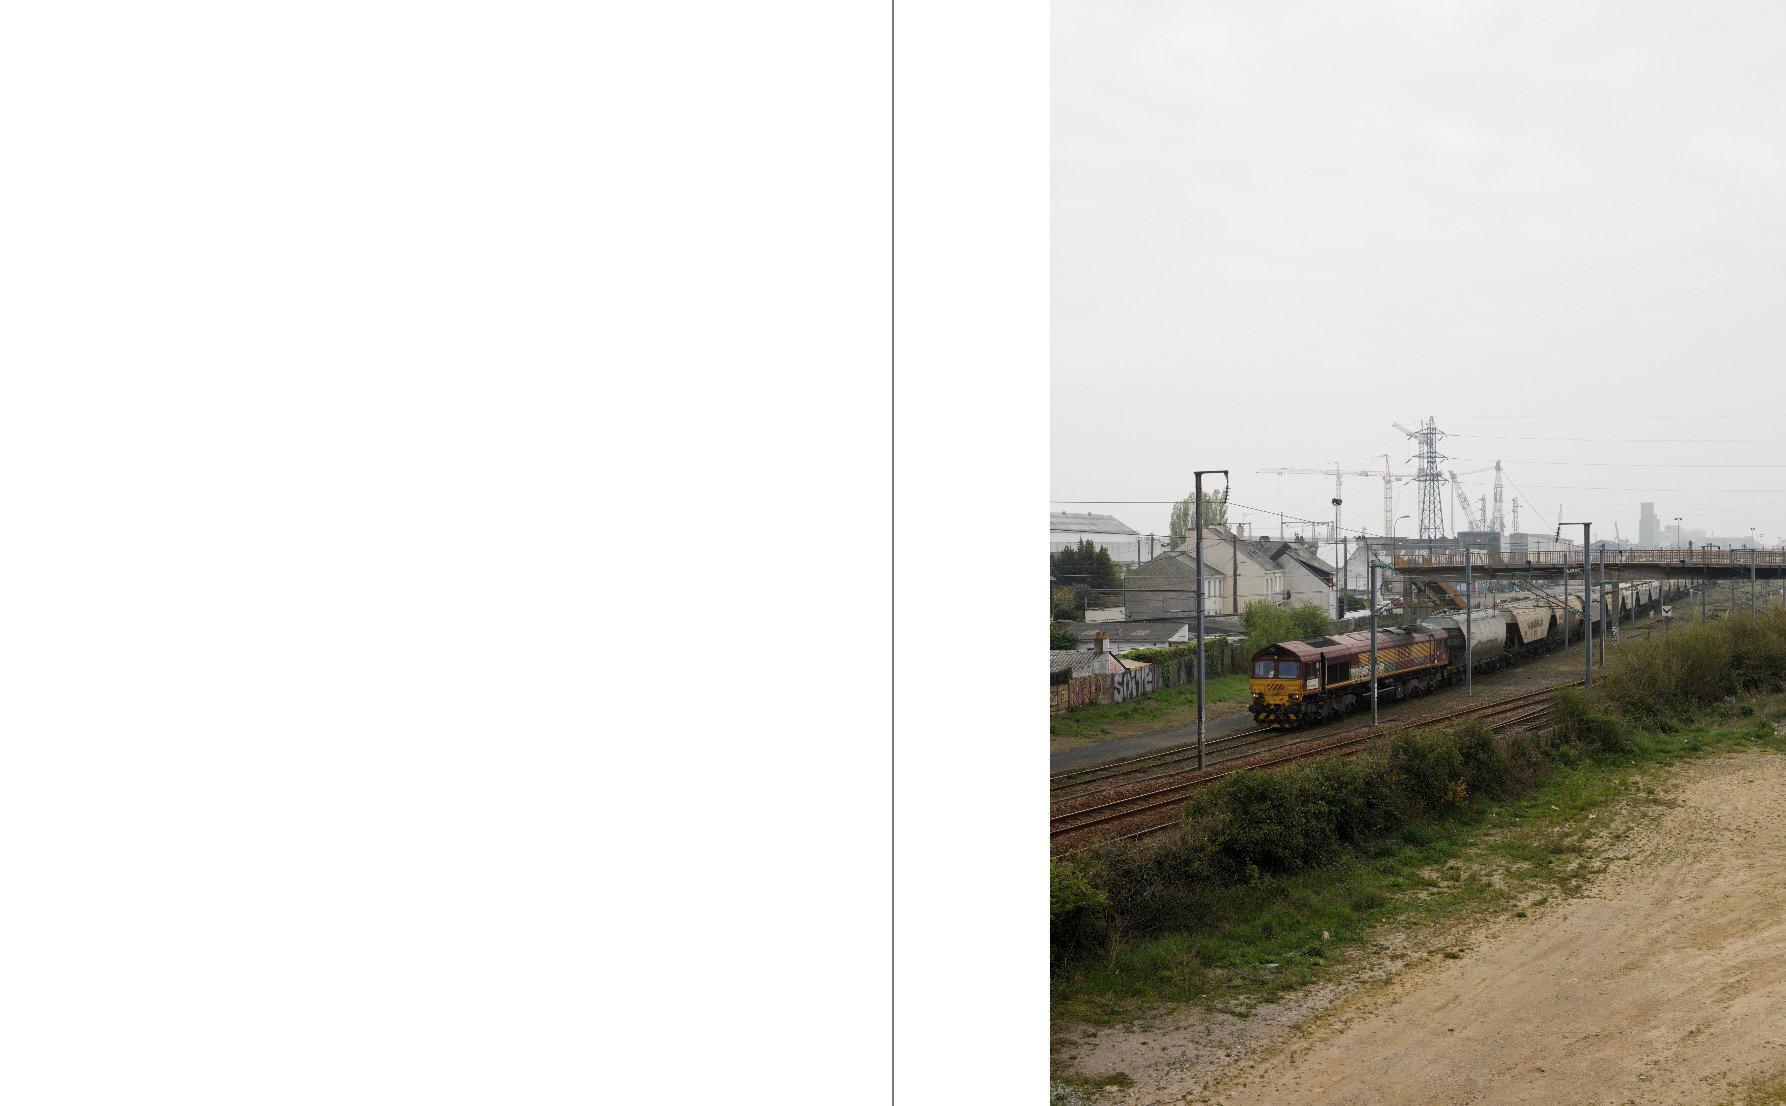 Trignac_Saint-Nazaire-page008.jpg